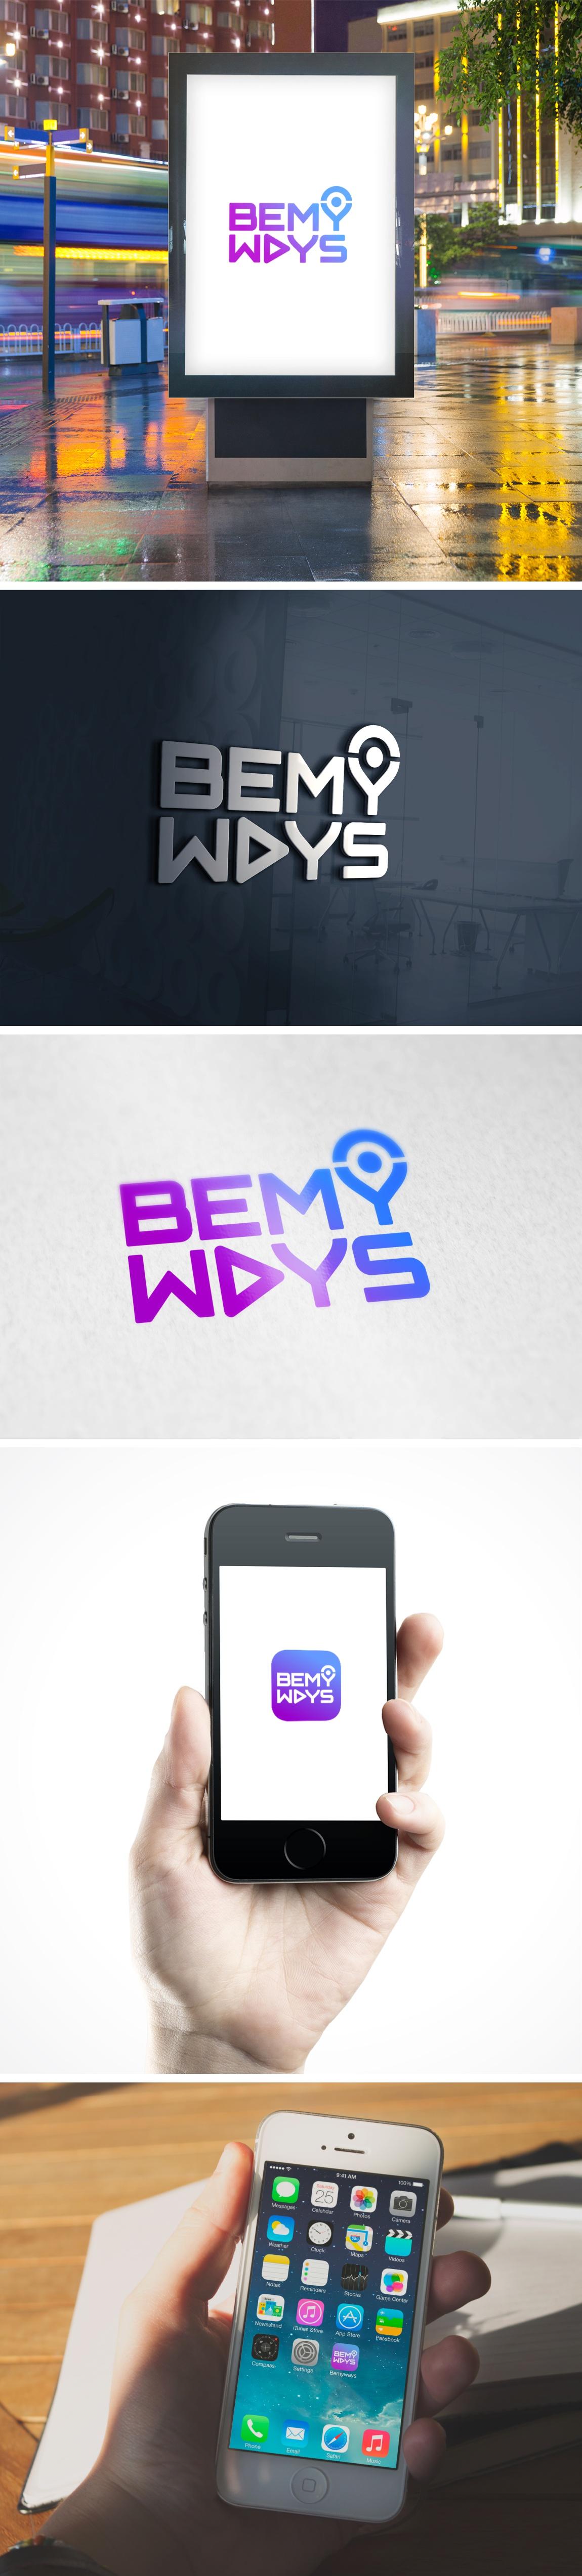 Разработка логотипа и иконки для Travel Video Platform фото f_0095c384ff62cb8a.jpg